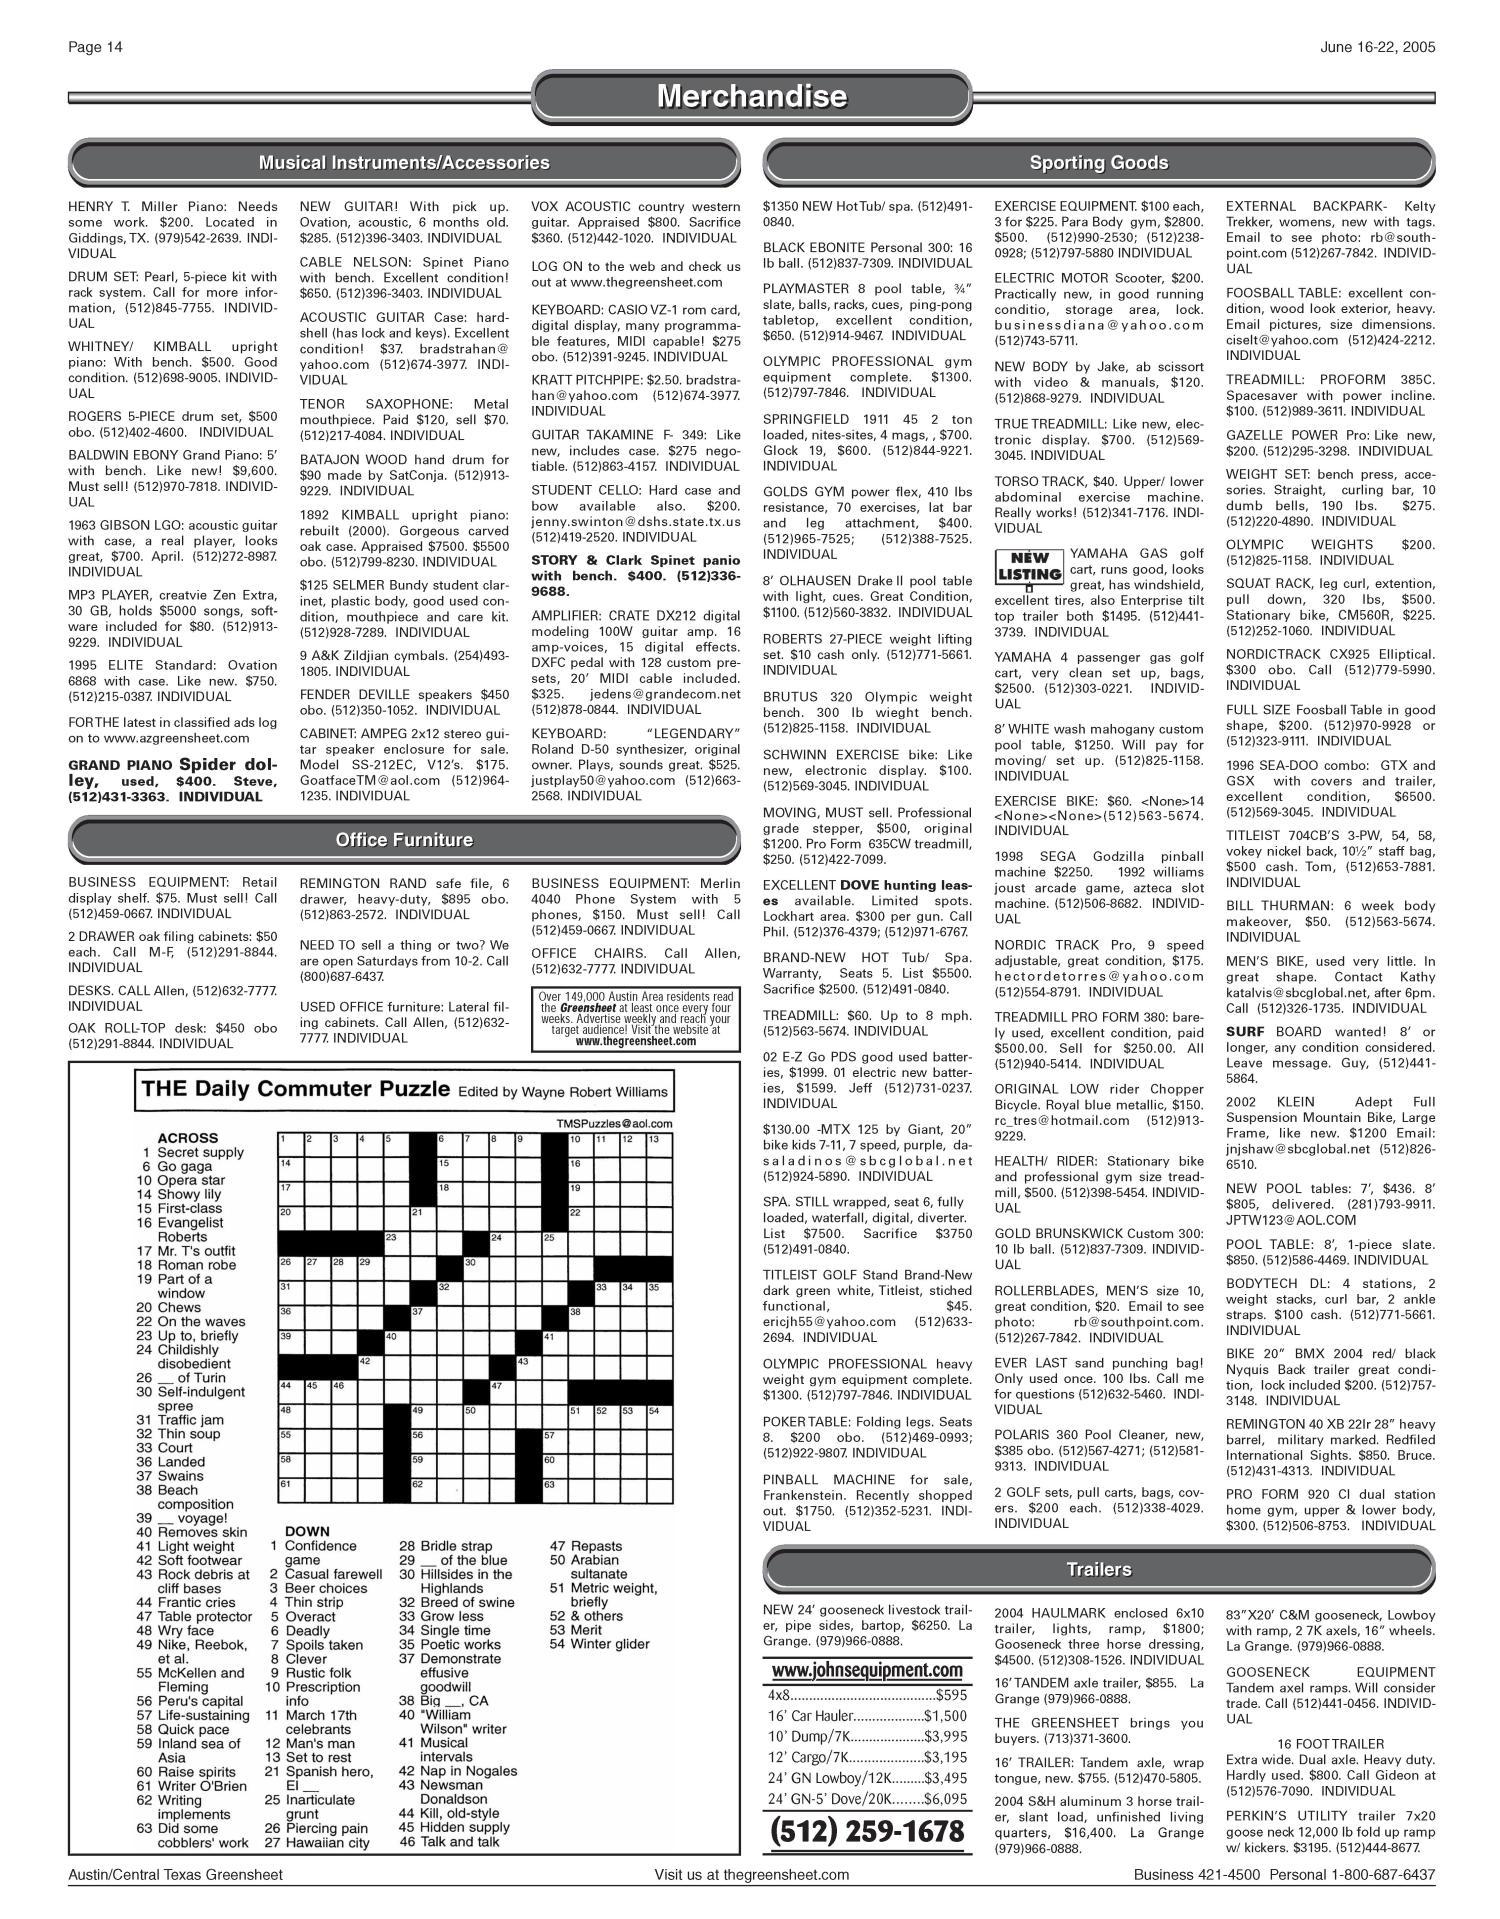 The Greensheet (Austin, Tex ), Vol  28, No  18, Ed  1 Thursday, June